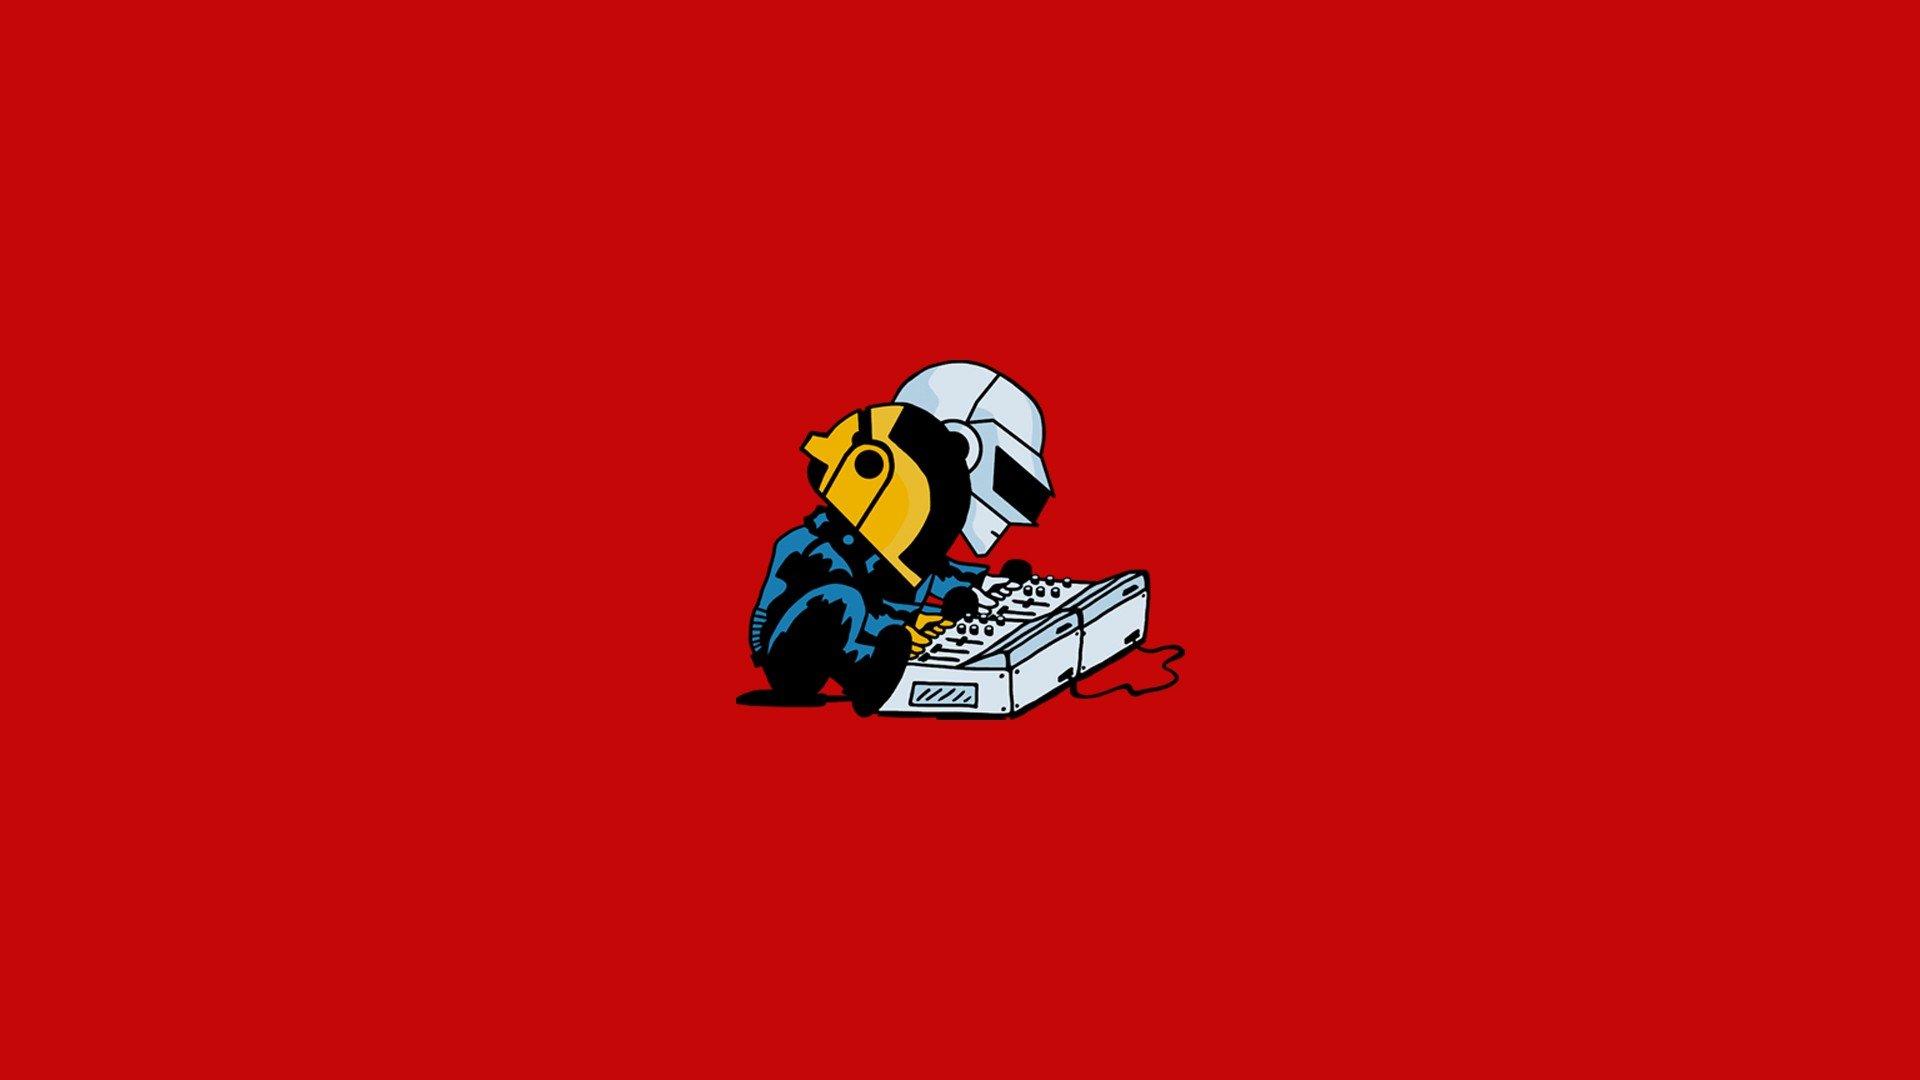 Superhero Hd Wallpapers Iphone Daft Punk Minimalism Hd Music 4k Wallpapers Images